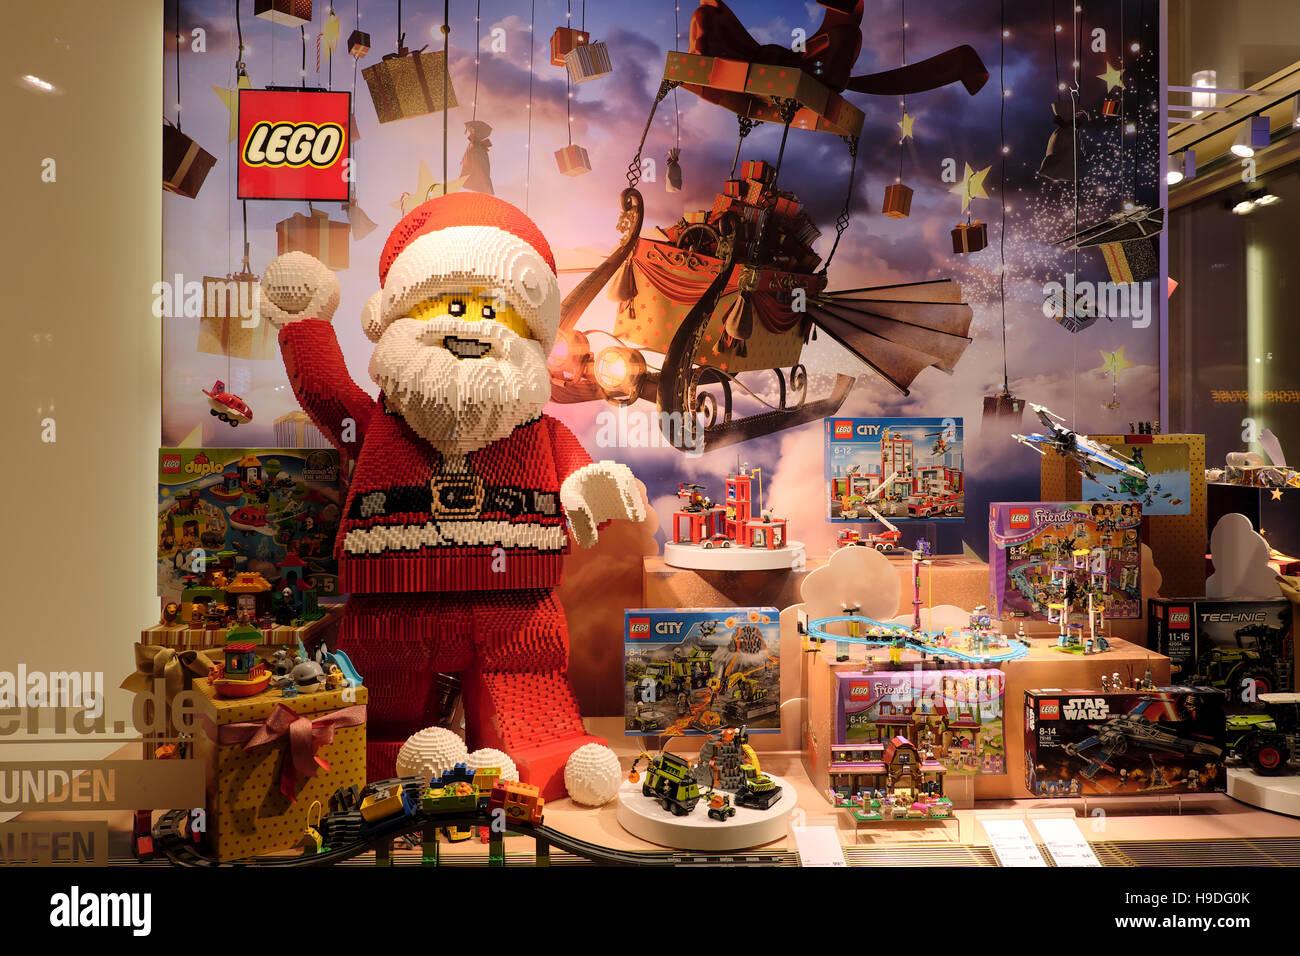 Lego At Xmas Display In Store Window Santa Claus Father Christmas Saint Nicholas Berlin Germany Europe KATHY DEWITT